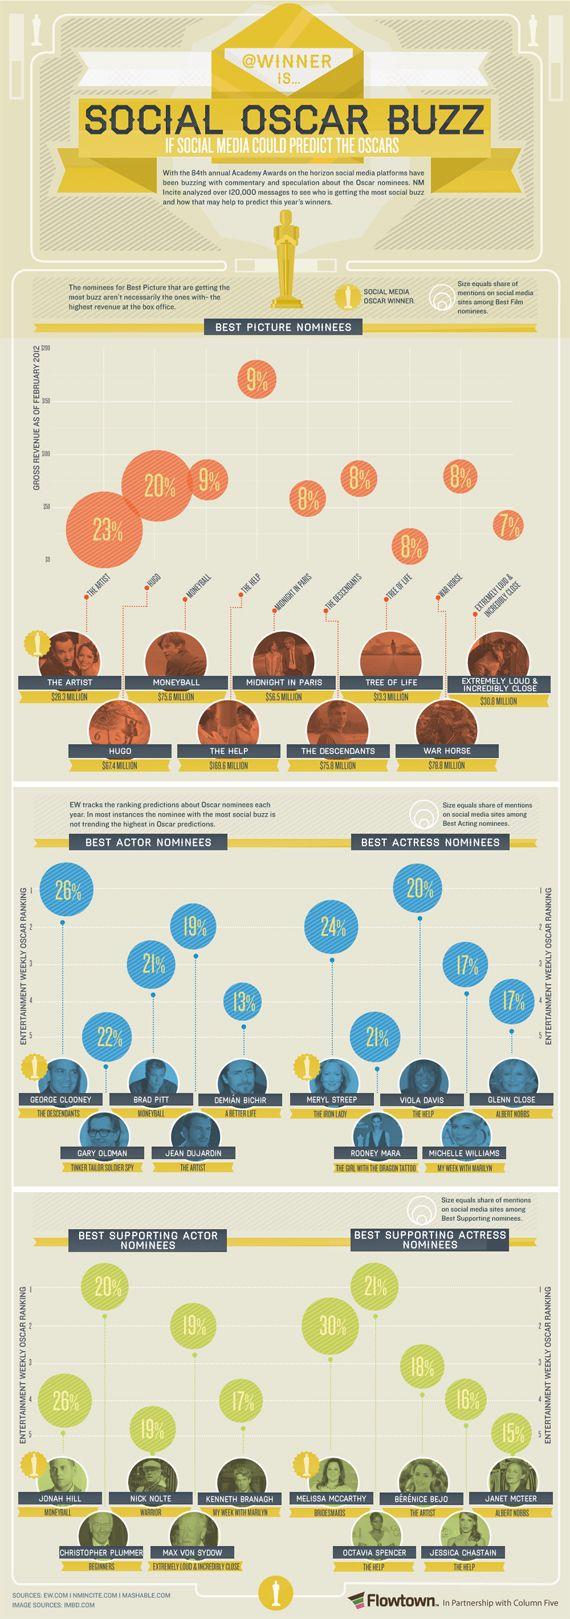 2012 social media Oscars predictions